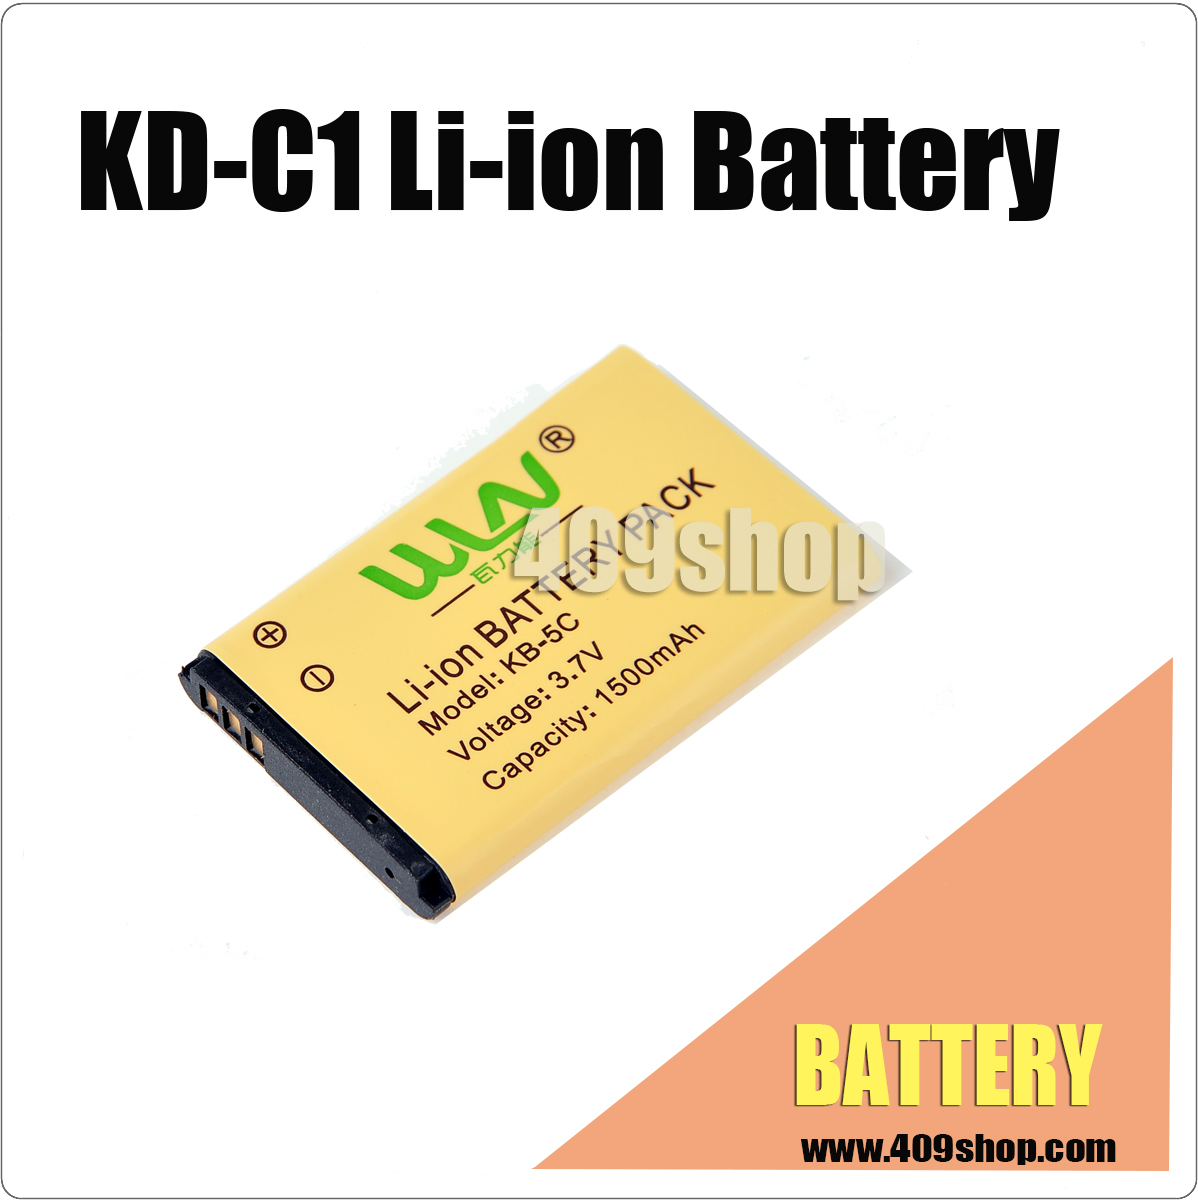 wln kd c1 battery 1500mah li ion 409shop walkie talkie buy two way radio wholesale retail. Black Bedroom Furniture Sets. Home Design Ideas